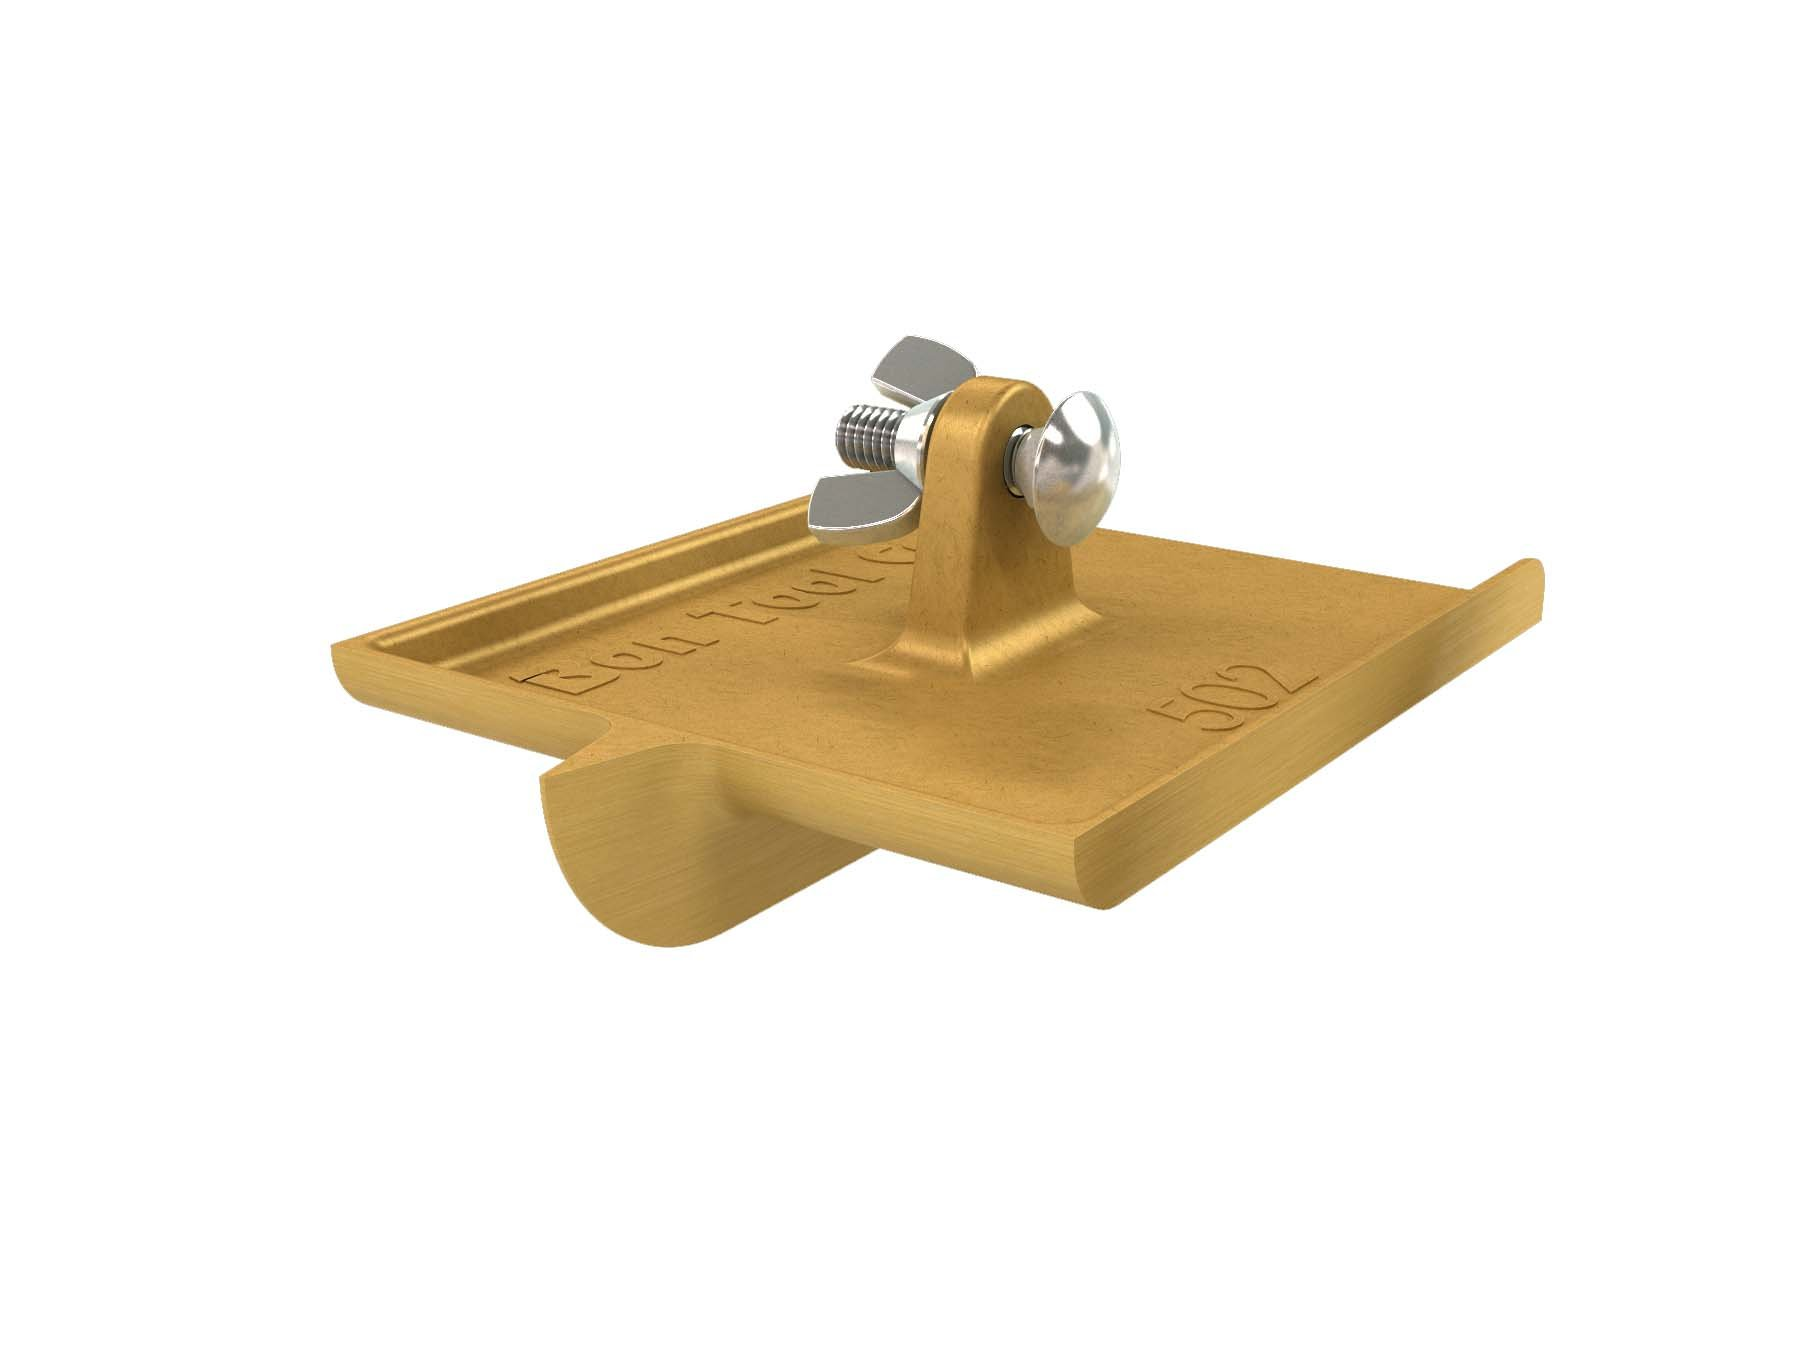 Bon 12-502 6-Inch by 4-1/2-Inch Bronze Walking Concrete Groover, 3/4-Inch Bit Depth, 3/8-Inch Bit Width